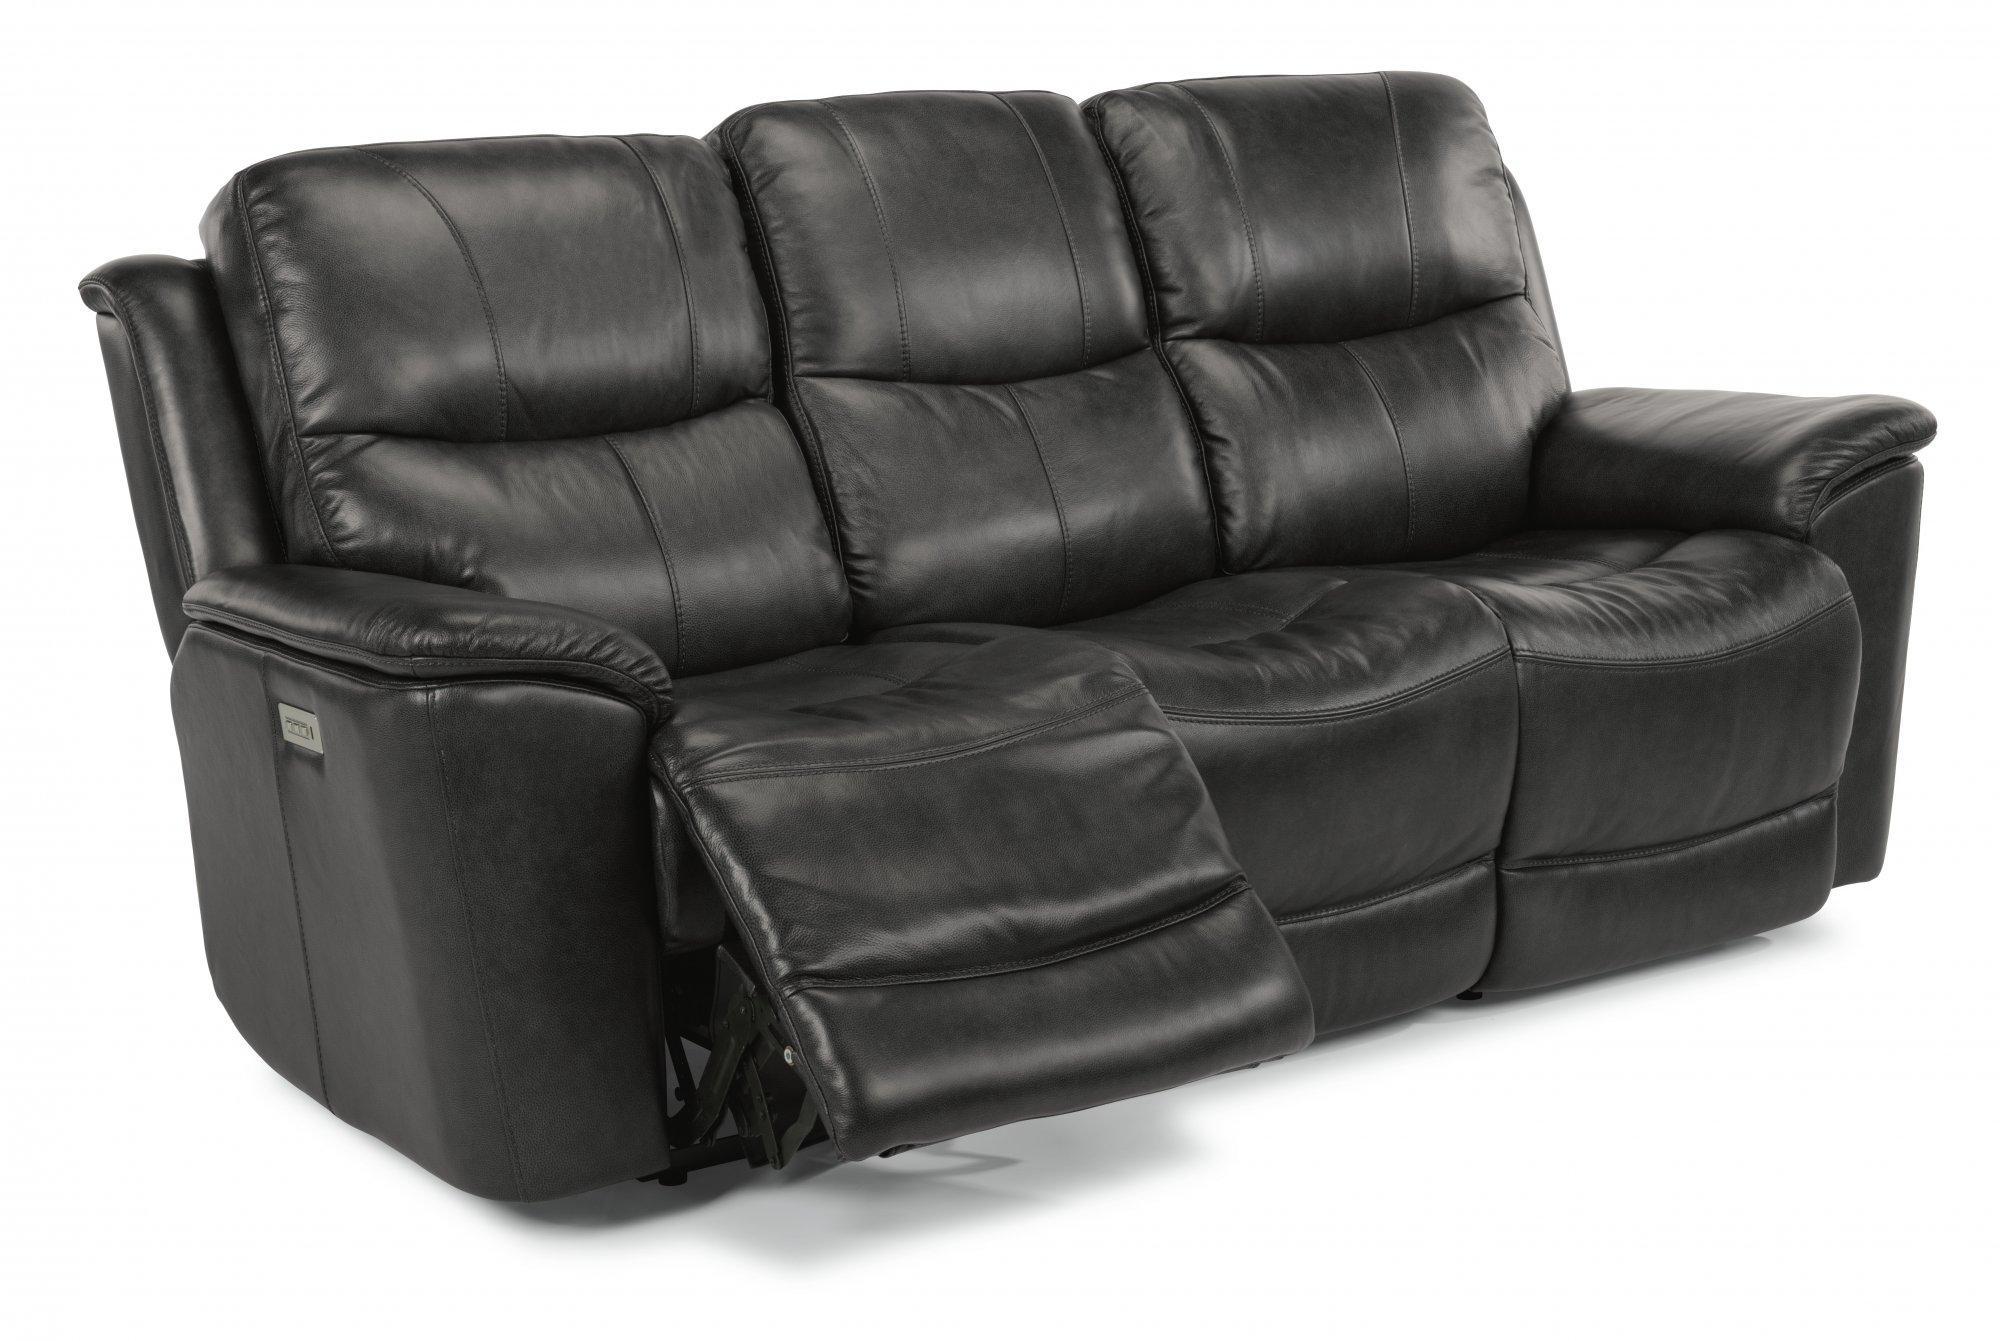 FlexsteelCade Power Reclining Sofa With Power Headrests & Lumbar